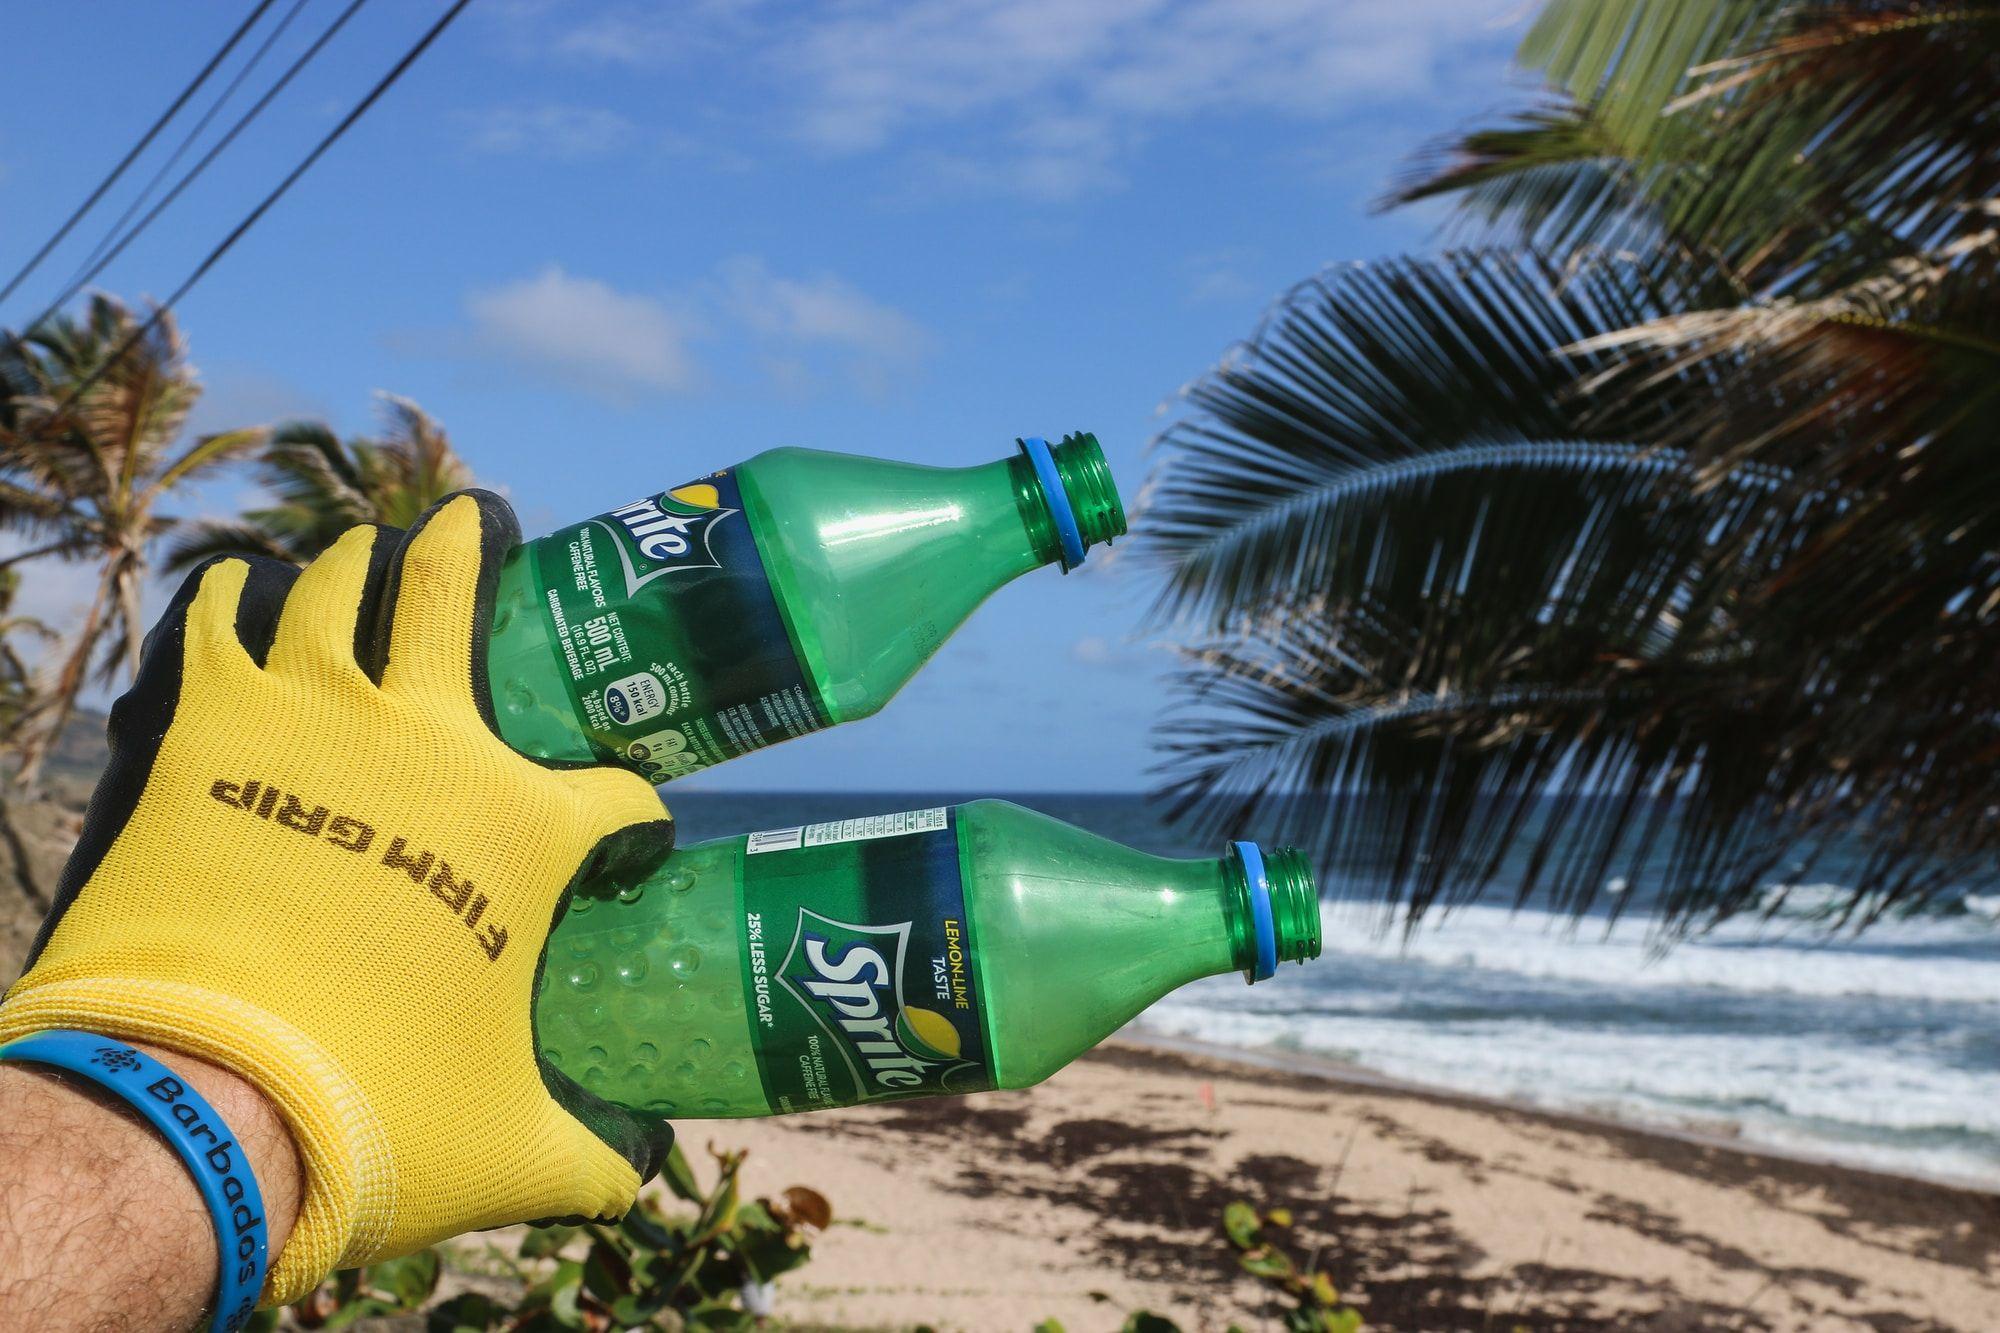 Beach Cleaner Picking Up 2 Plastic Sprite Bottles